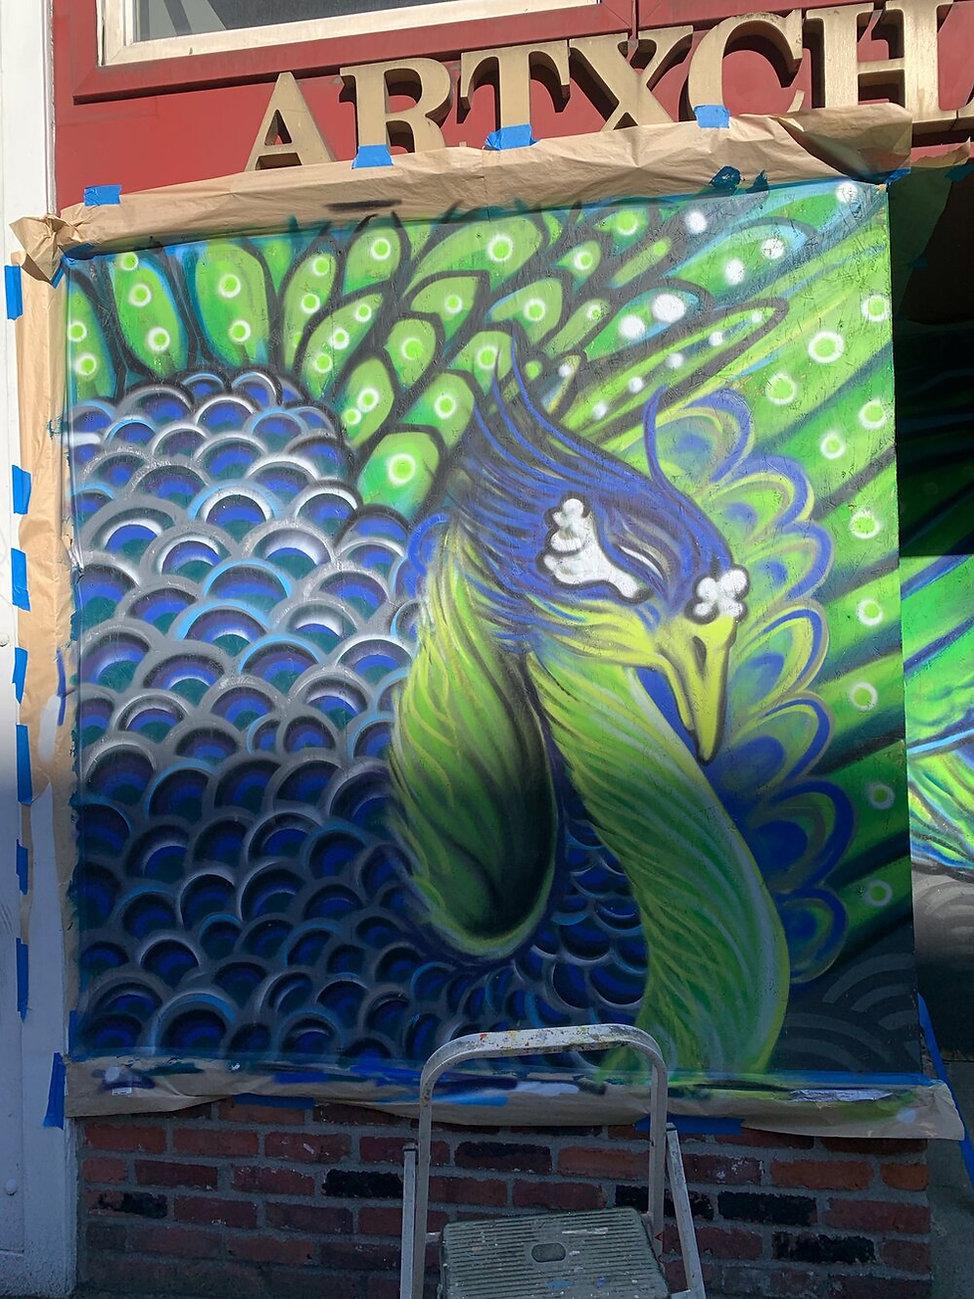 WakudaStudio_Murals_Rise_Again_11_Artxch